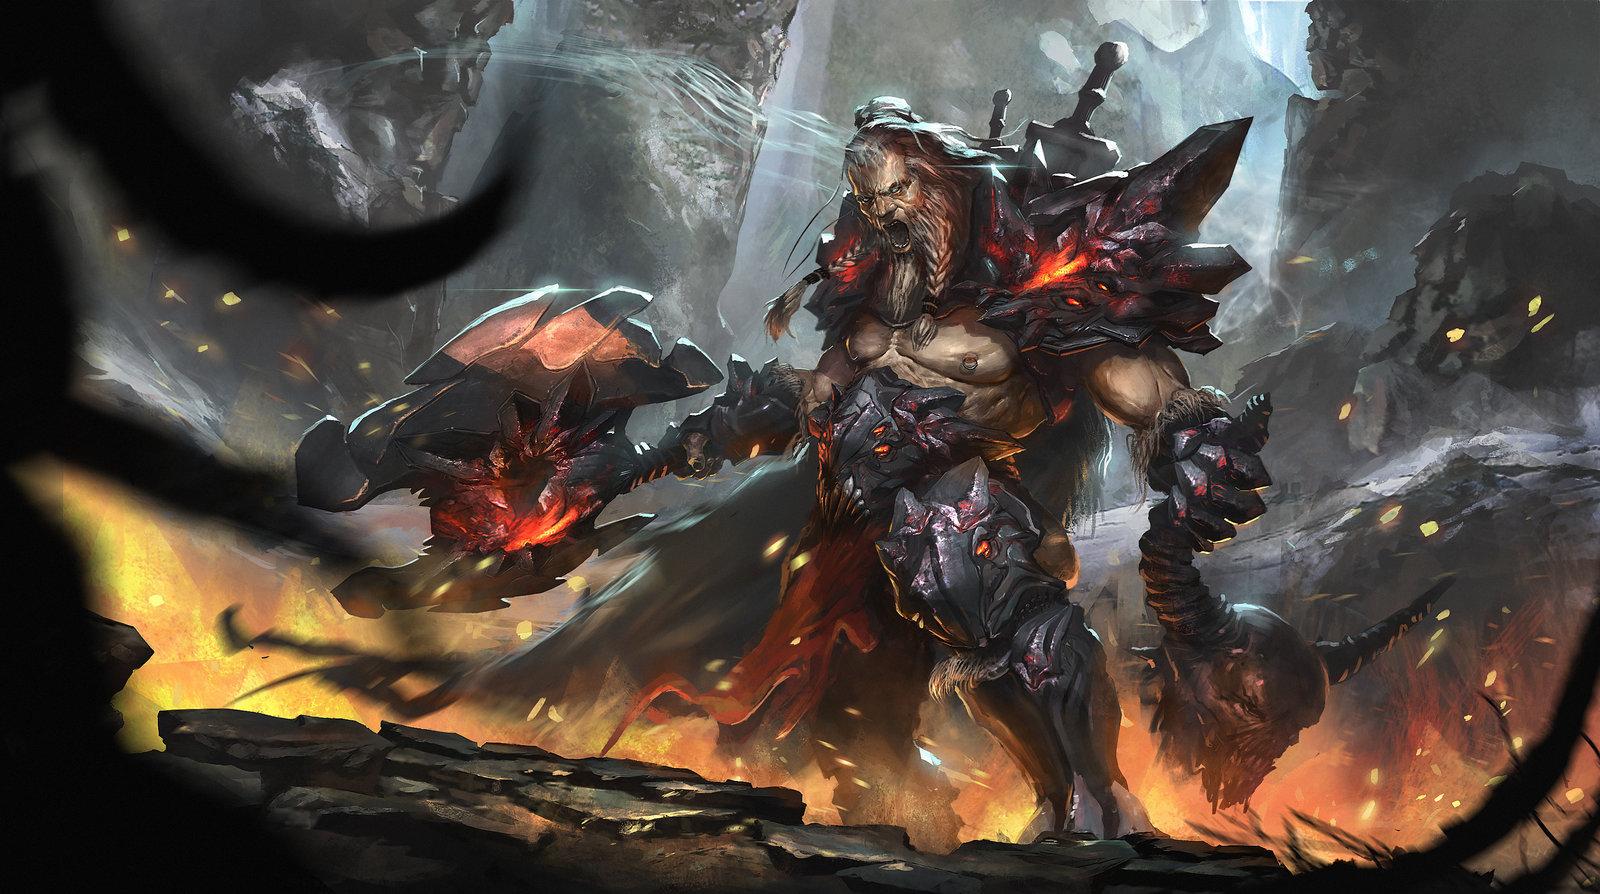 milan-nikolic-diablo-3-barbarian-by-nookiew-d7a091x-1.jpg